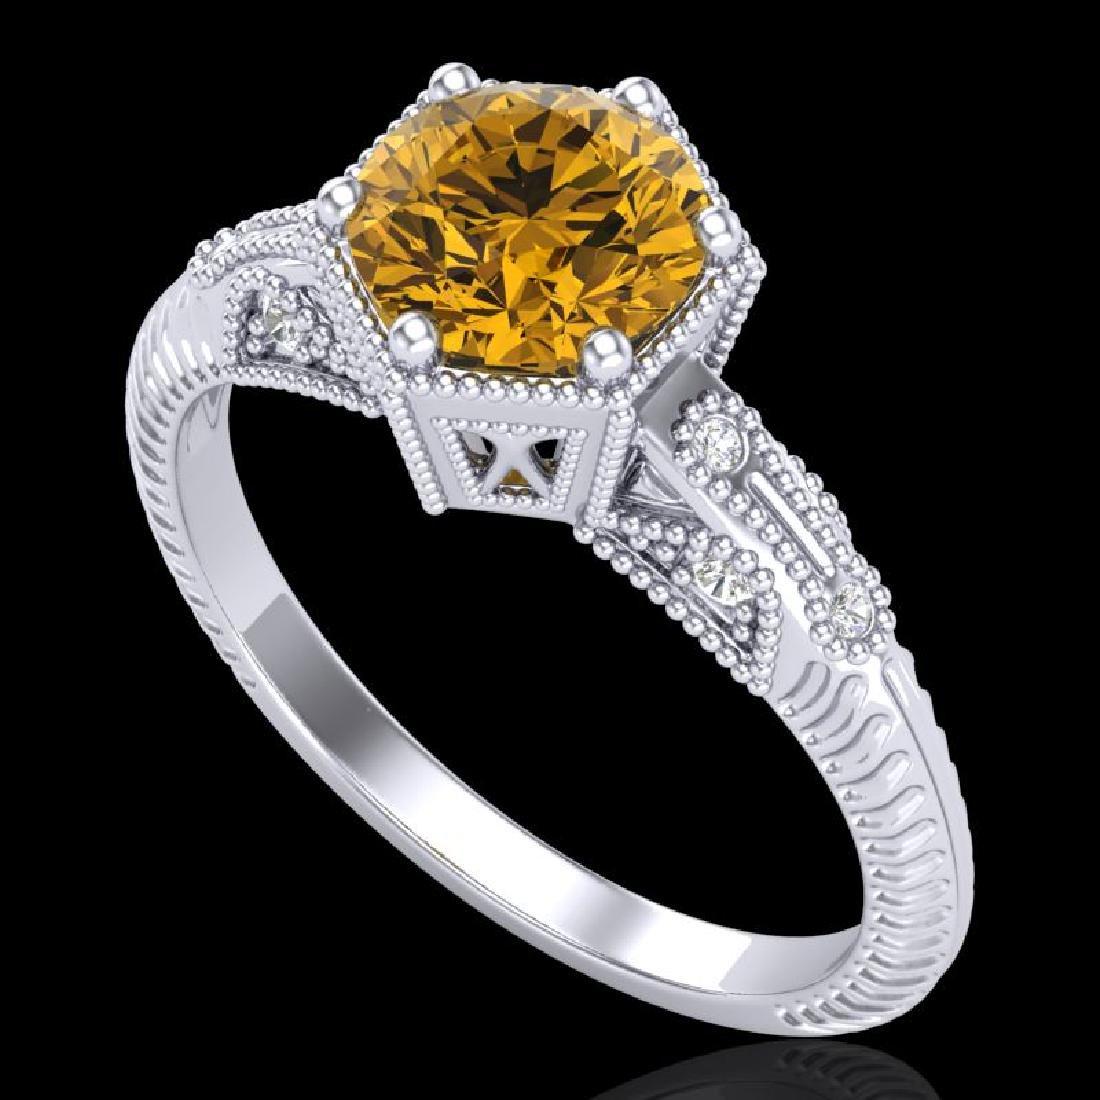 1.17 CTW Intense Fancy Yellow Diamond Engagement Art